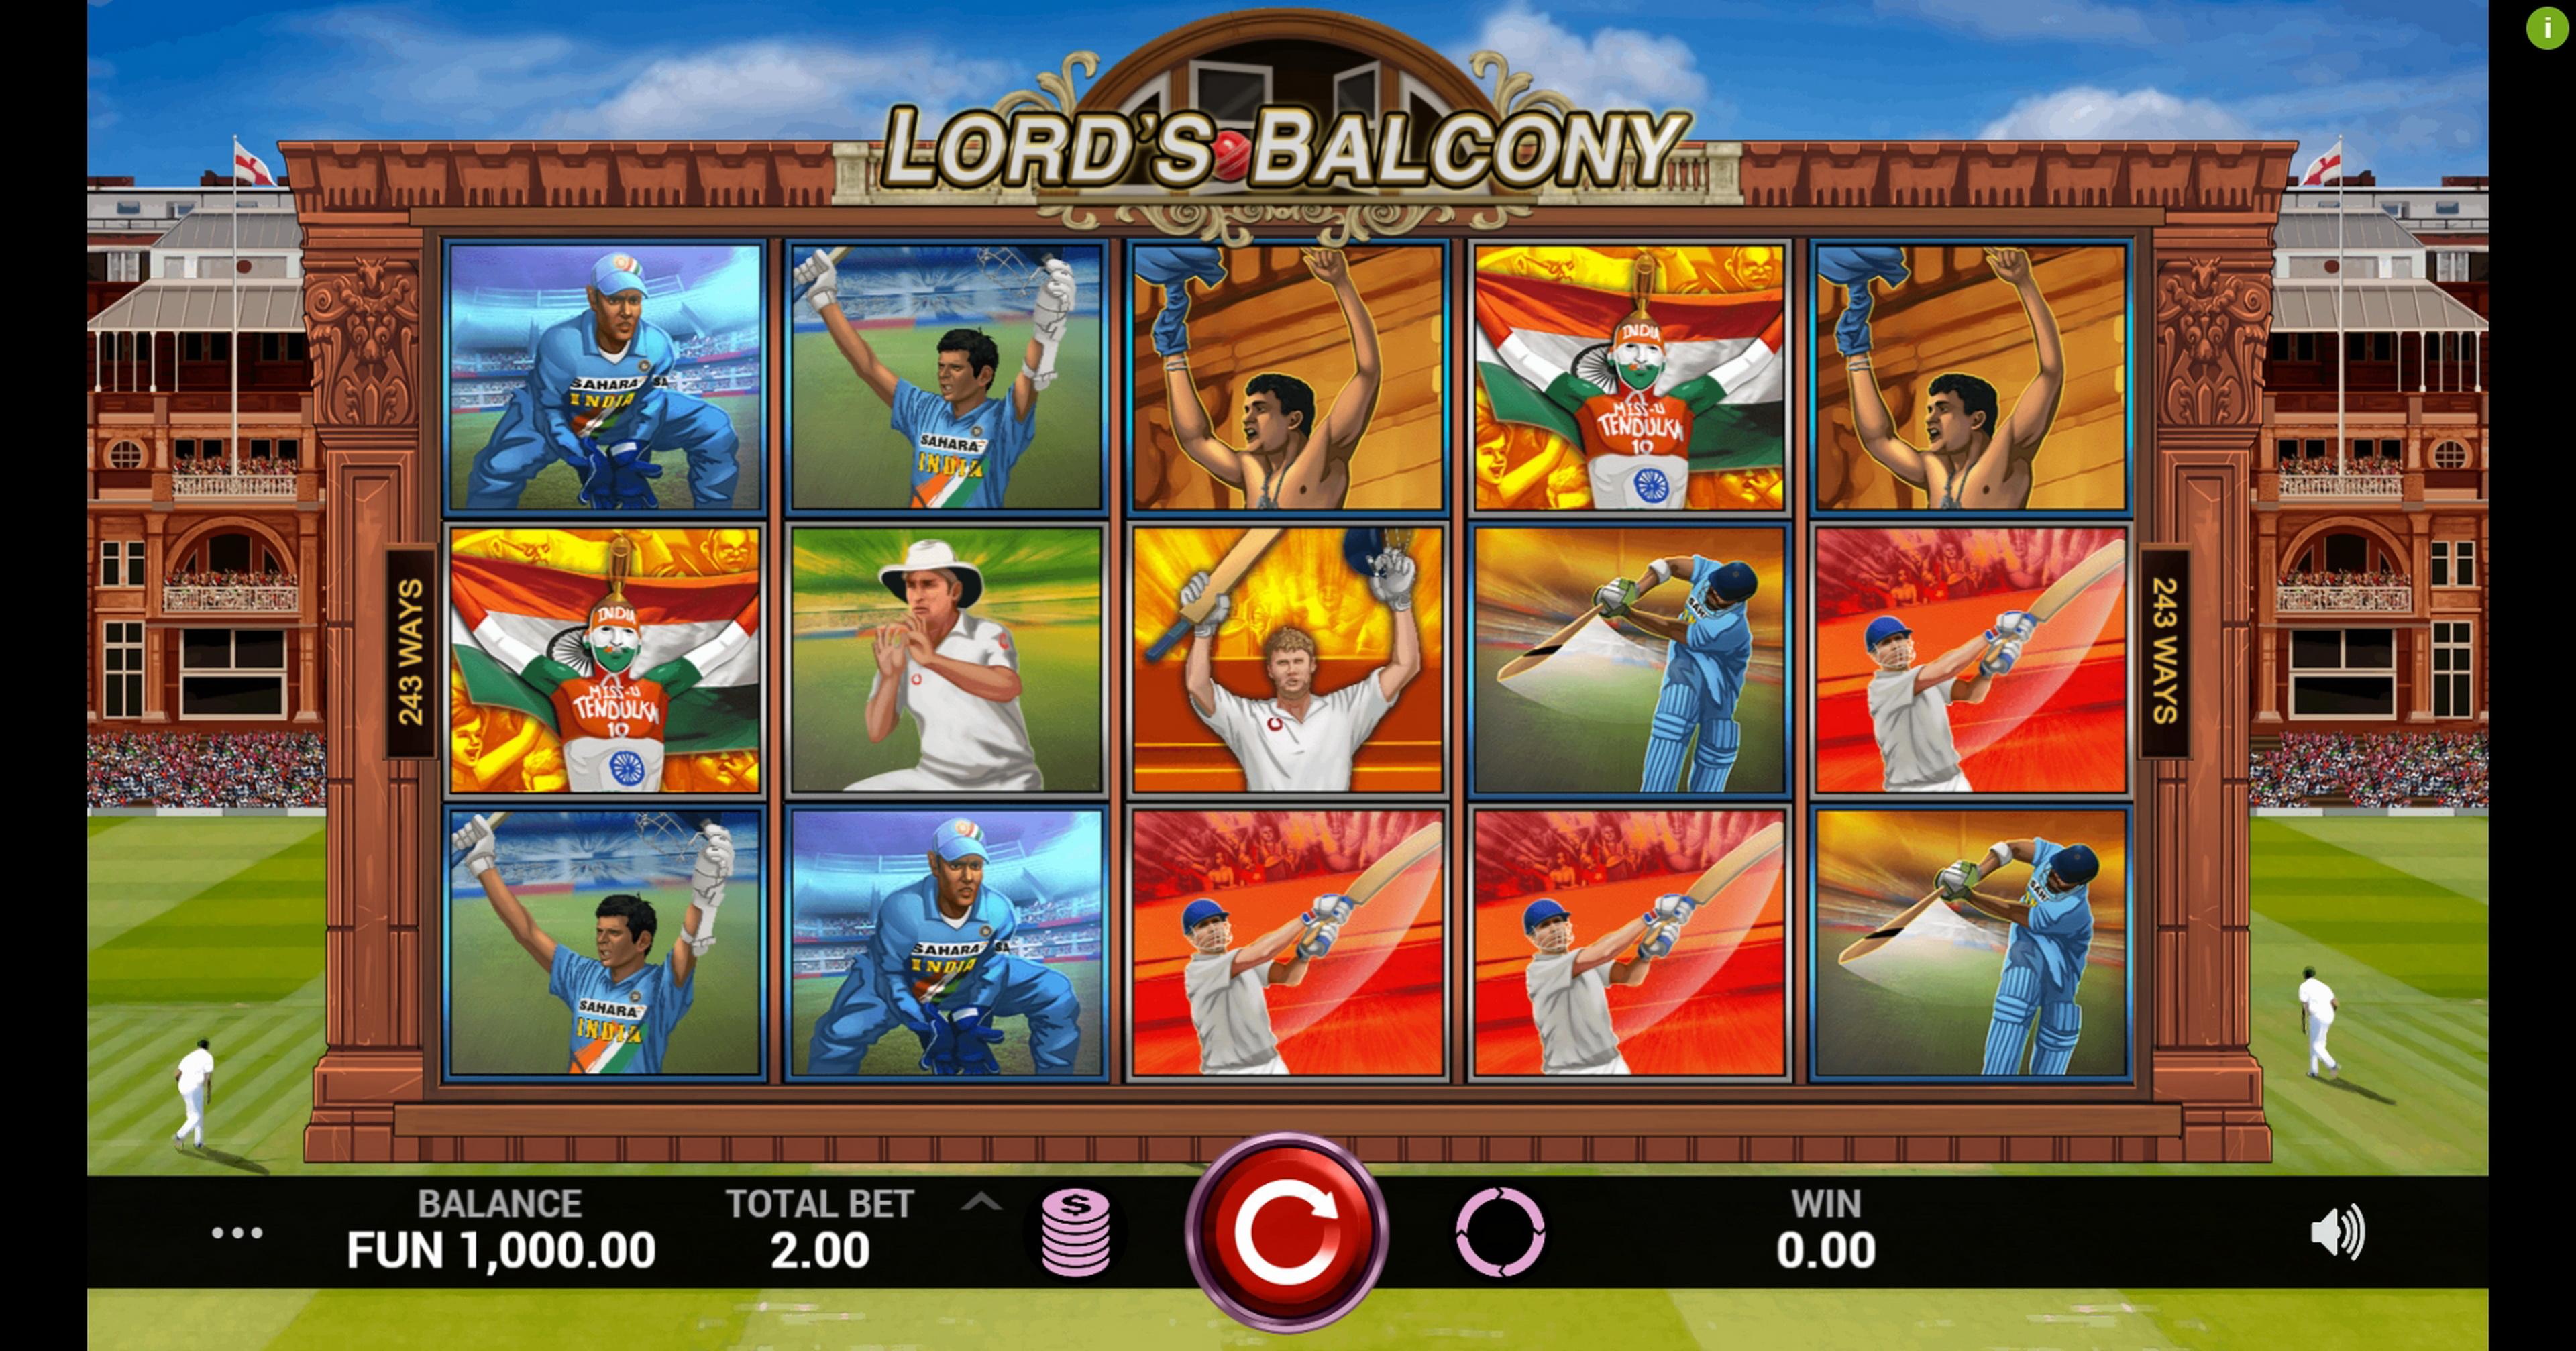 Free Slot Machine Demo Games